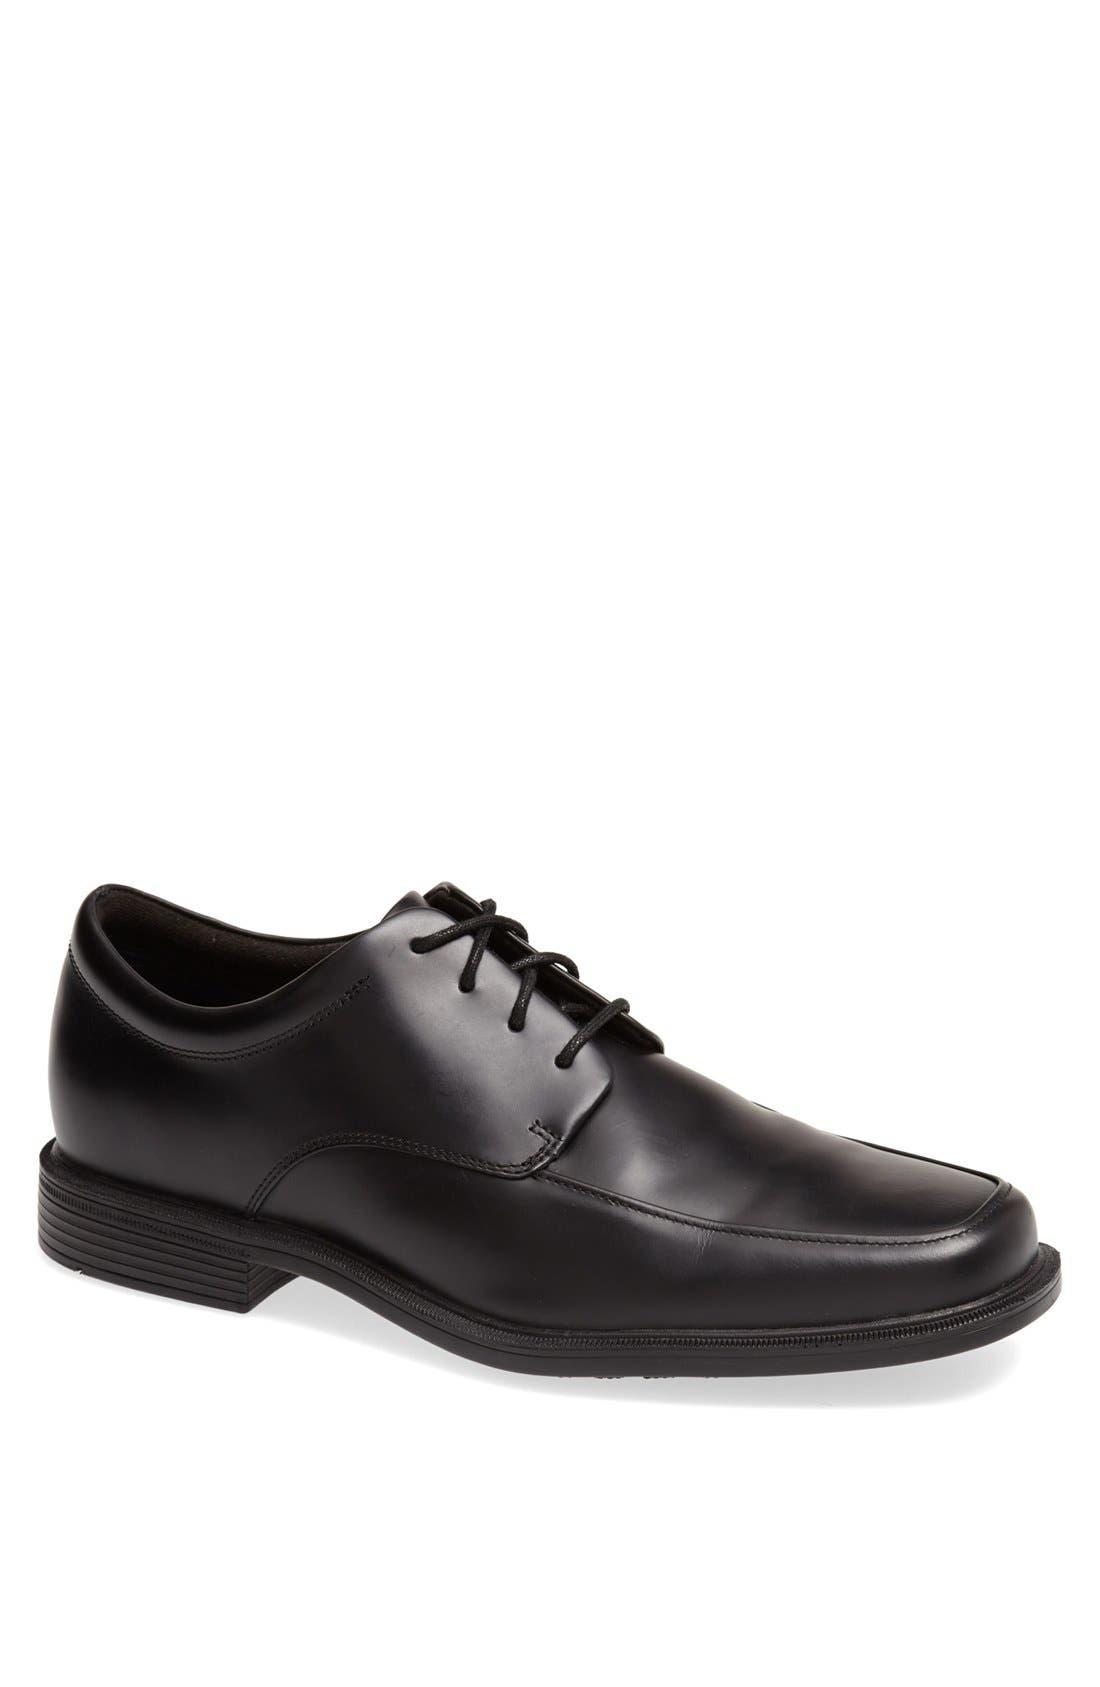 'Evander' Oxford,                         Main,                         color, Black